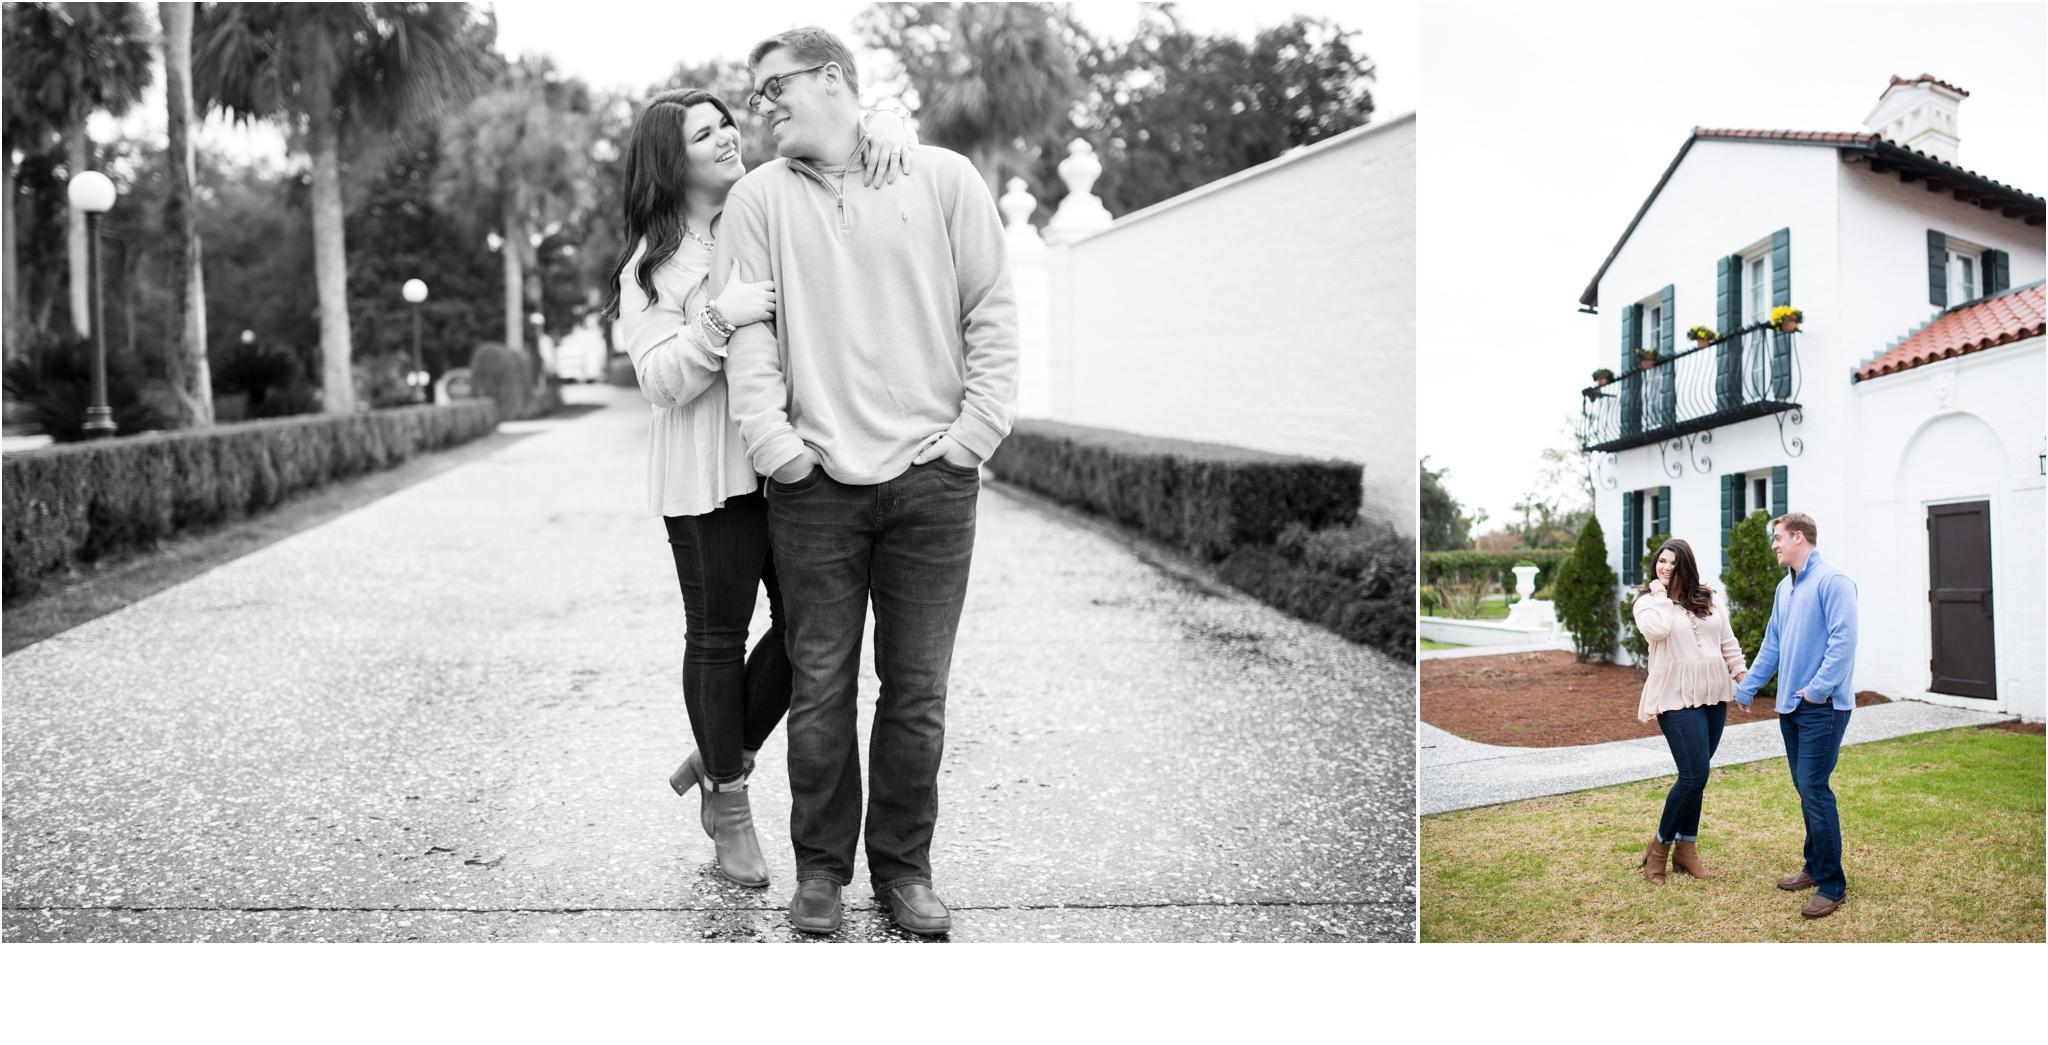 Rainey_Gregg_Photography_St._Simons_Island_Georgia_California_Wedding_Portrait_Photography_0576.jpg